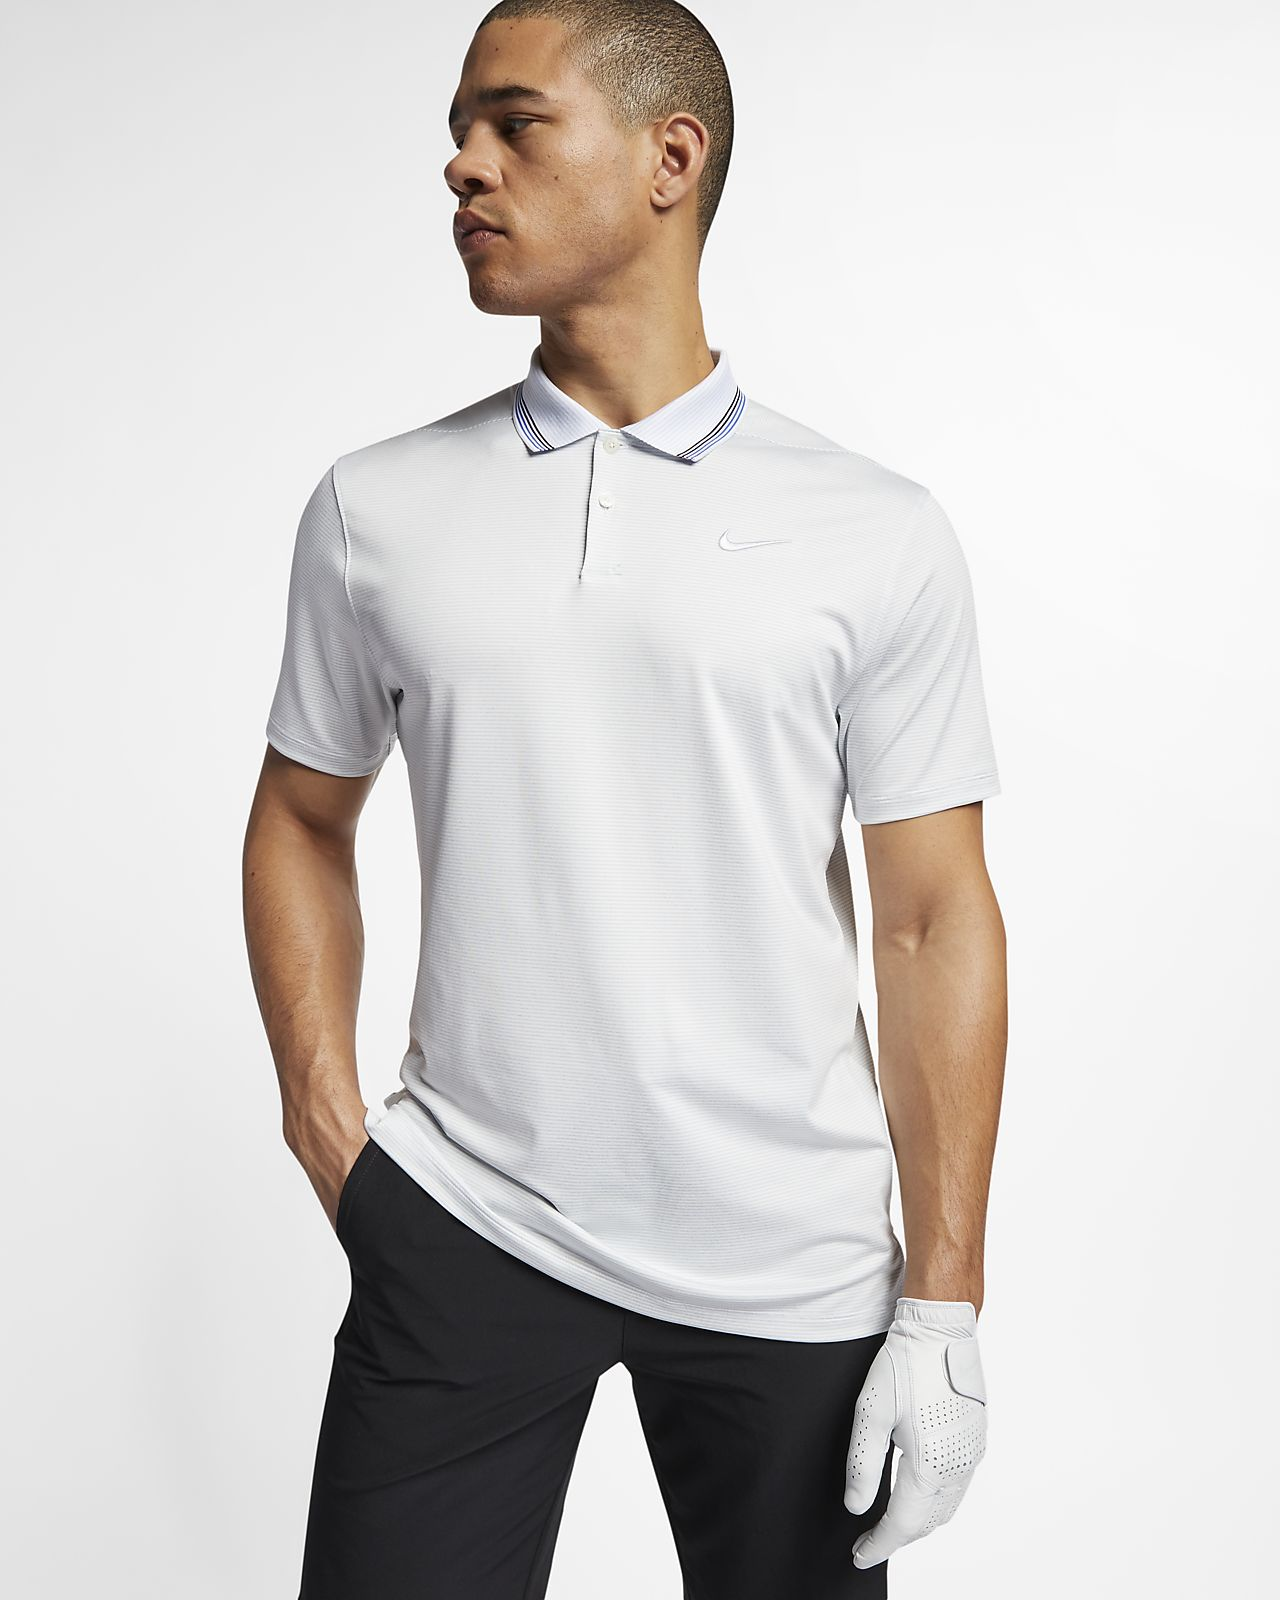 Nike Dri-FIT Vapor-golfpolo til mænd